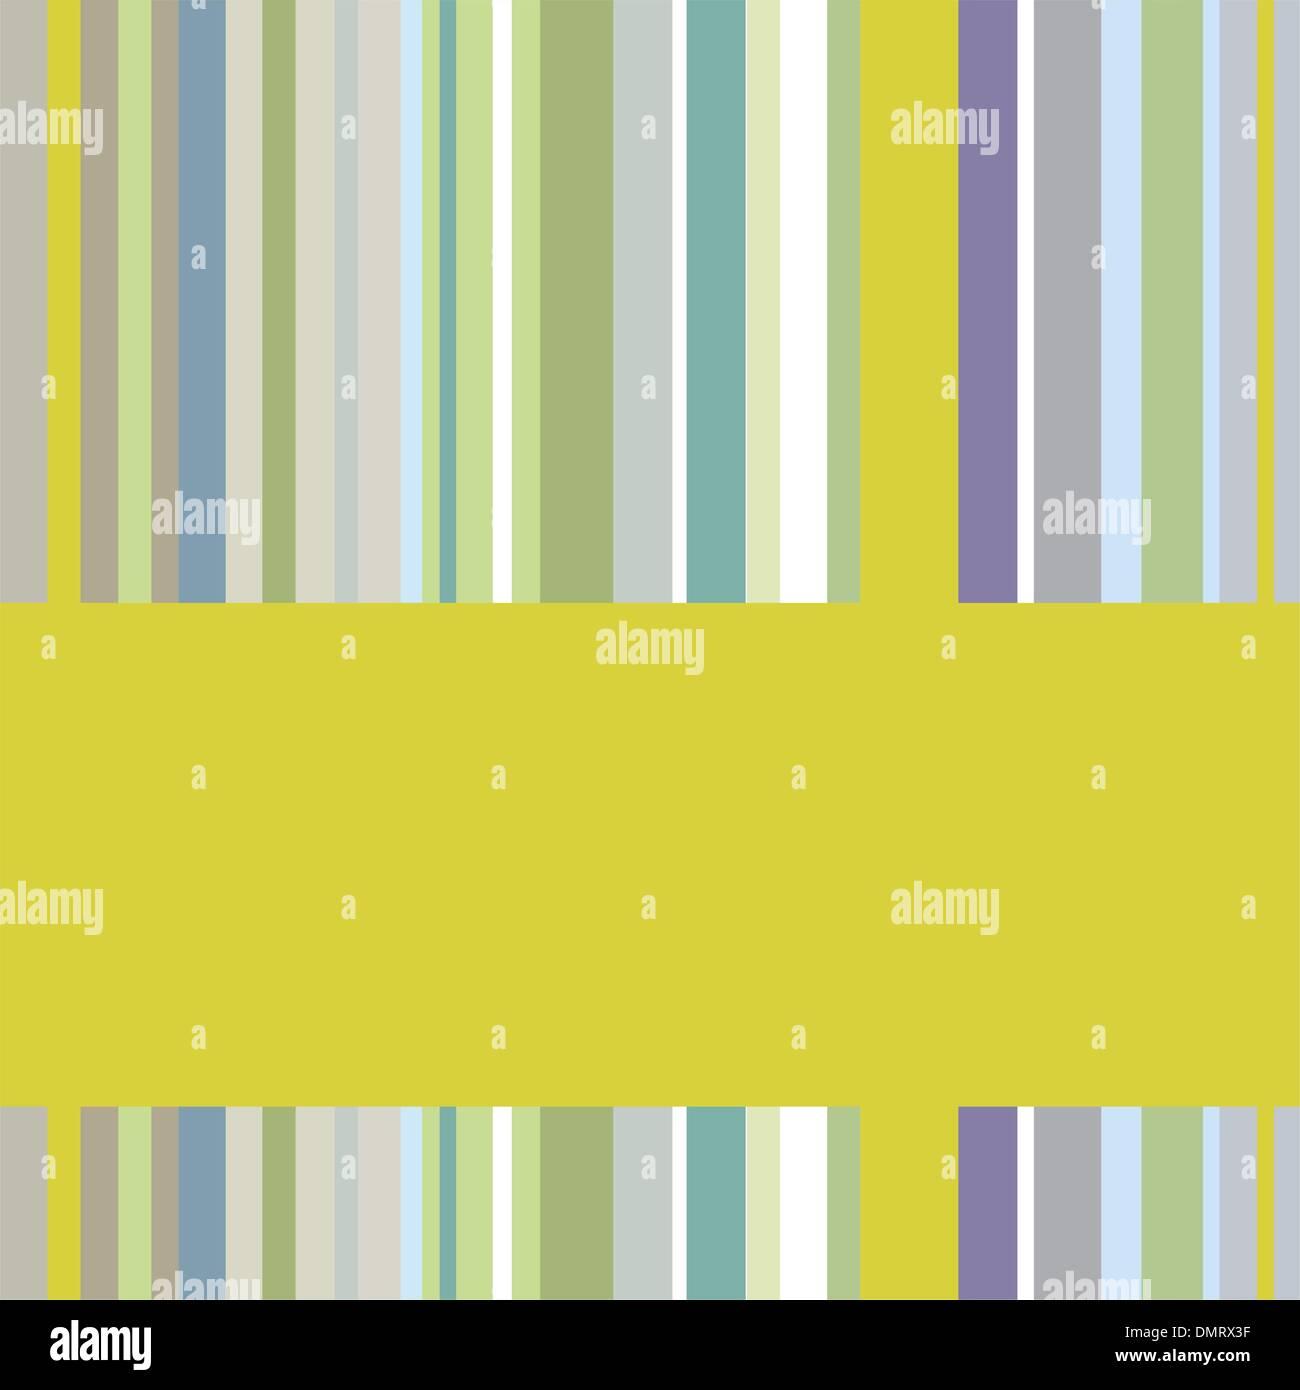 Grunge-Vektor-Hintergrund Stockbild